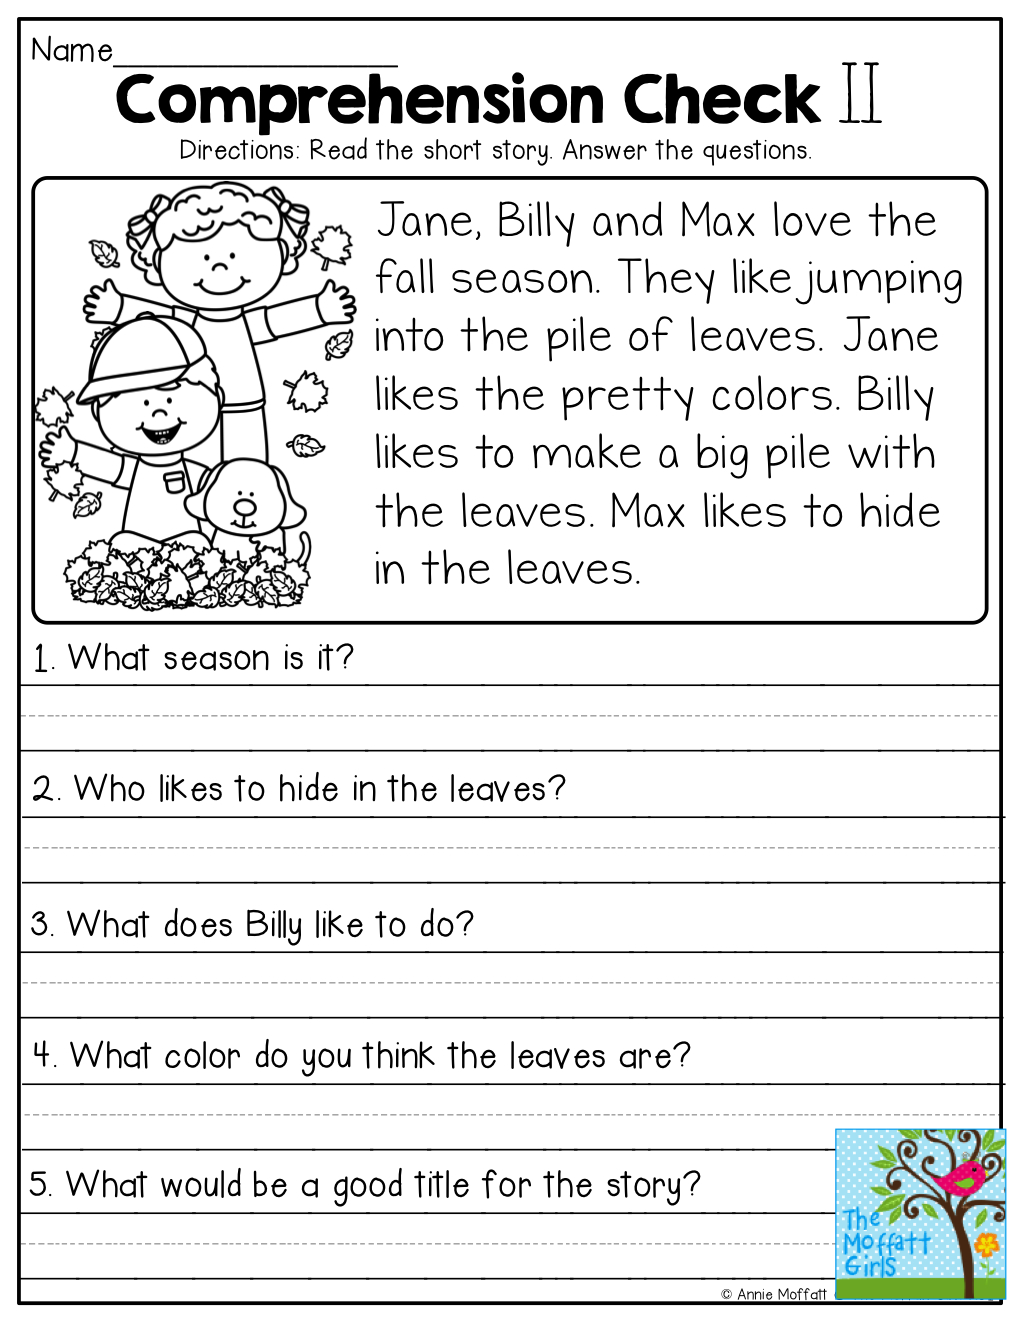 Free Printable Reading Comprehension Worksheets Grade 5 ...